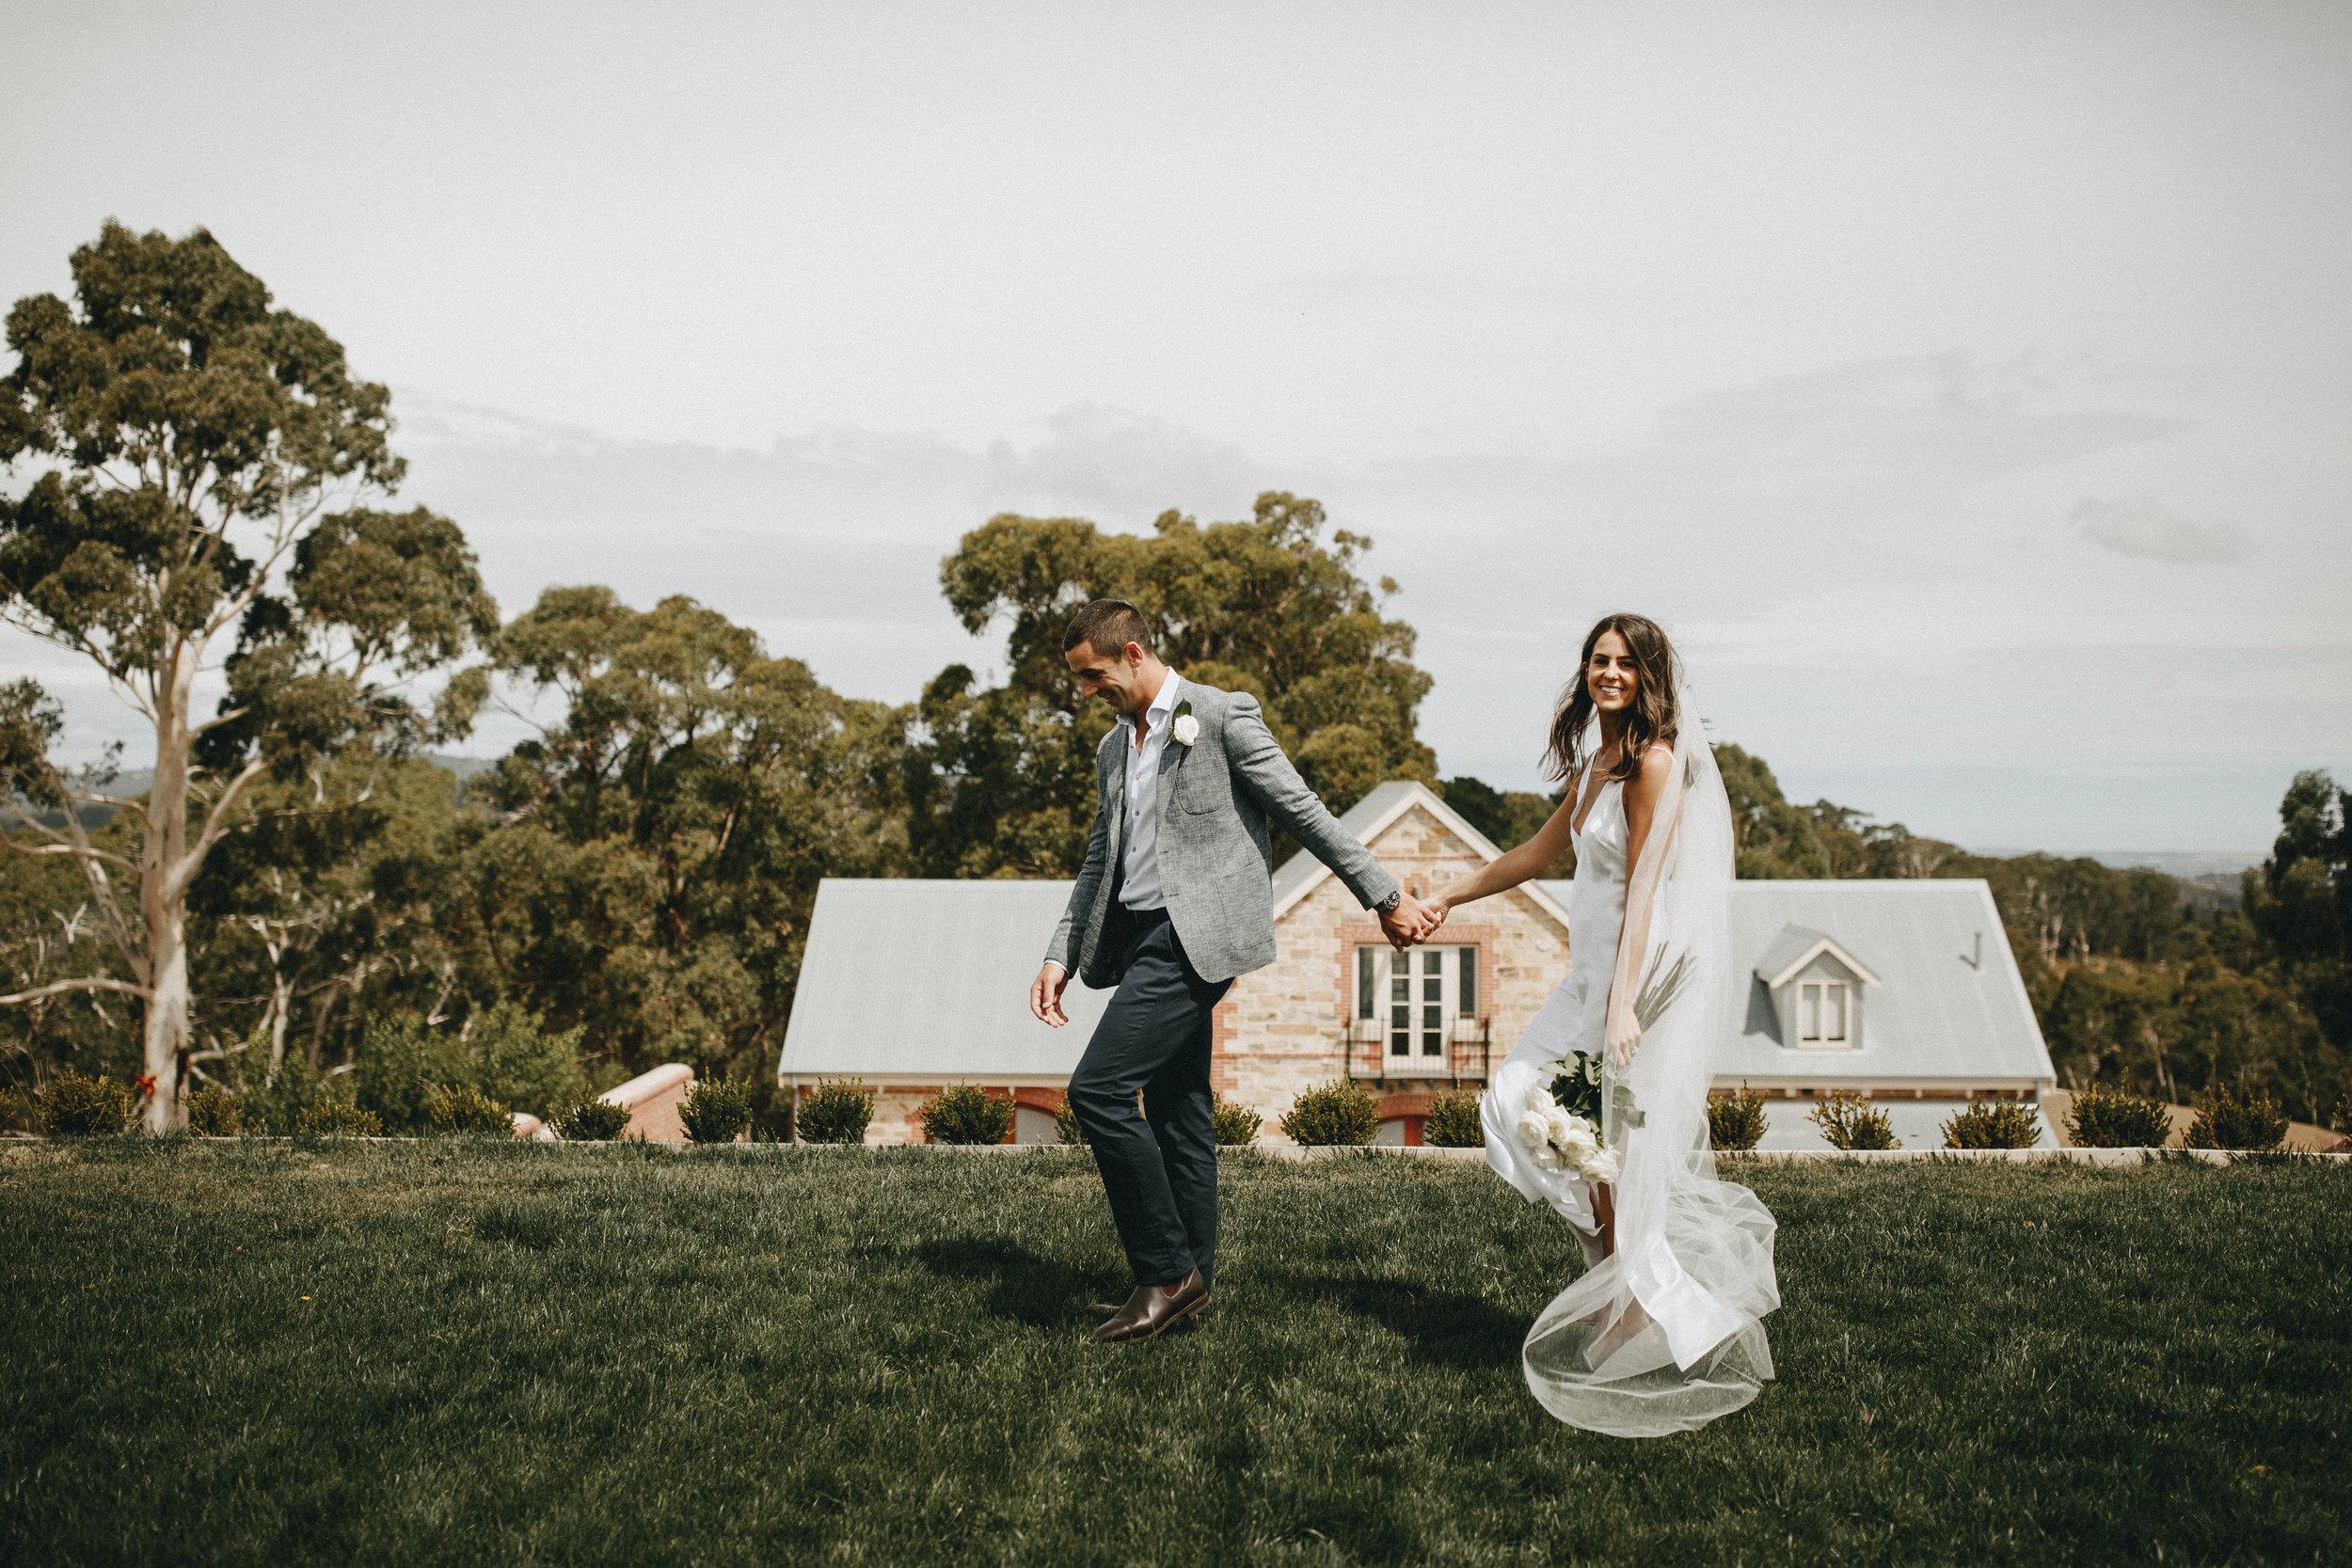 BYBHS_WEDDING_TAYLOR&ELLIE_HI-RES_13.jpg